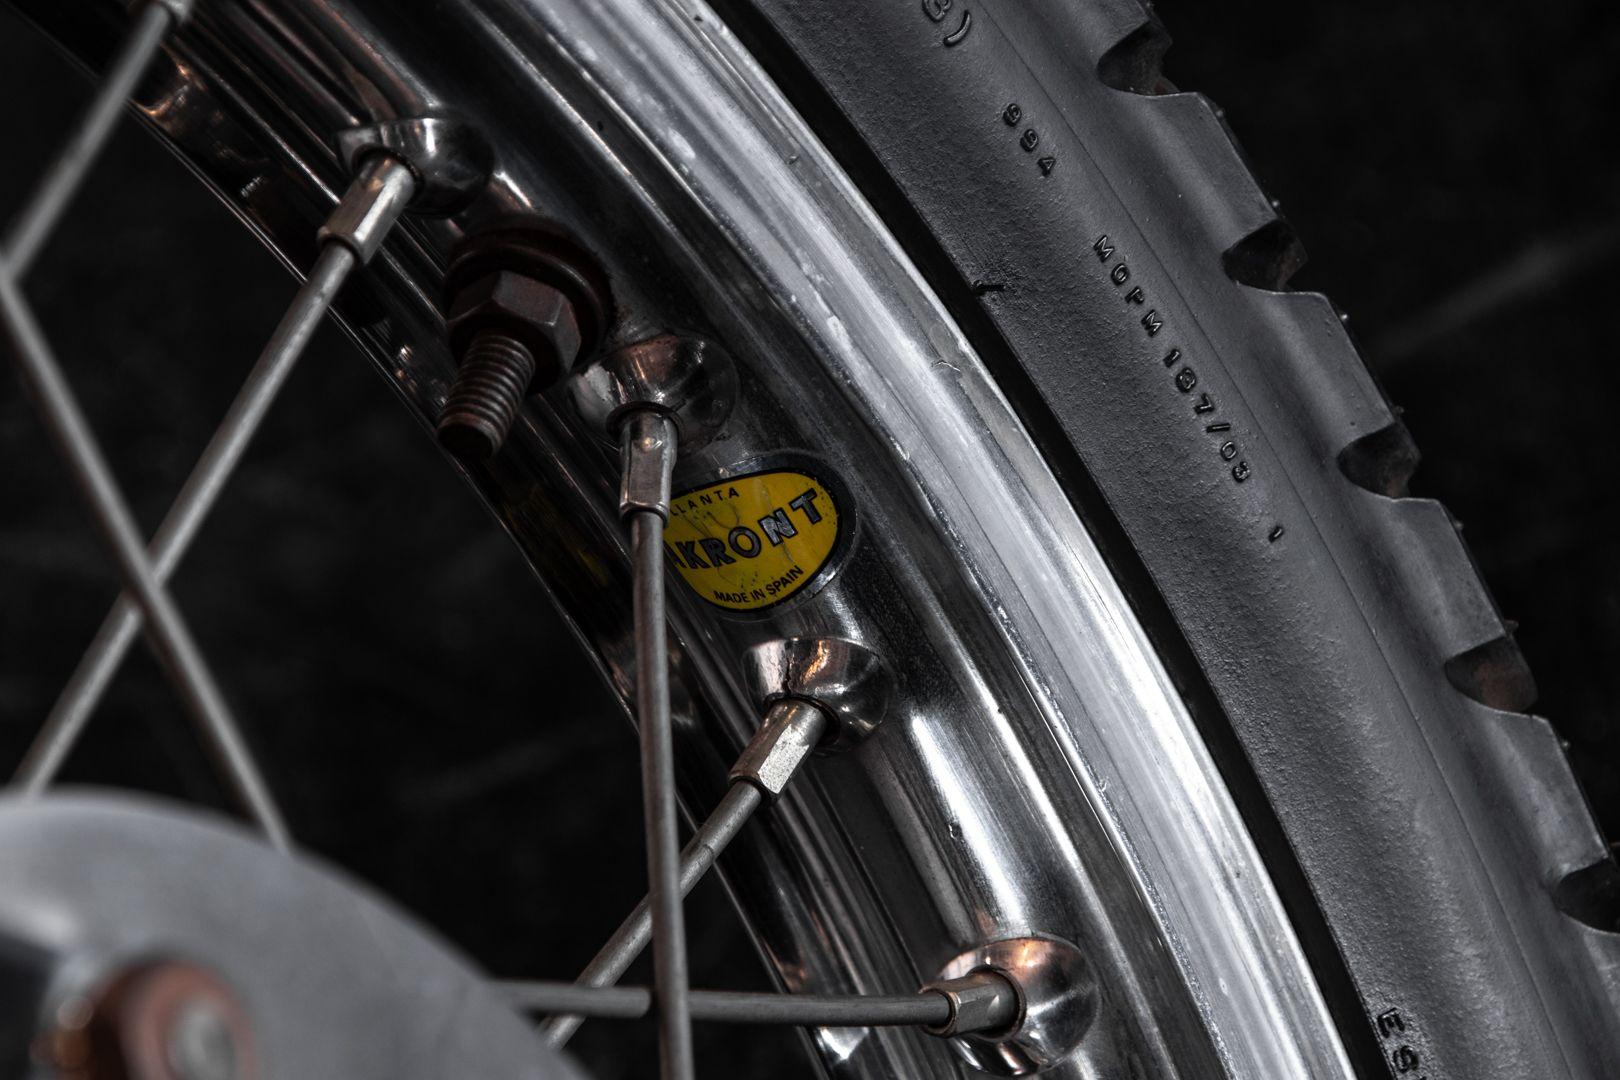 1970 Triumph TRIBSA 500 69932